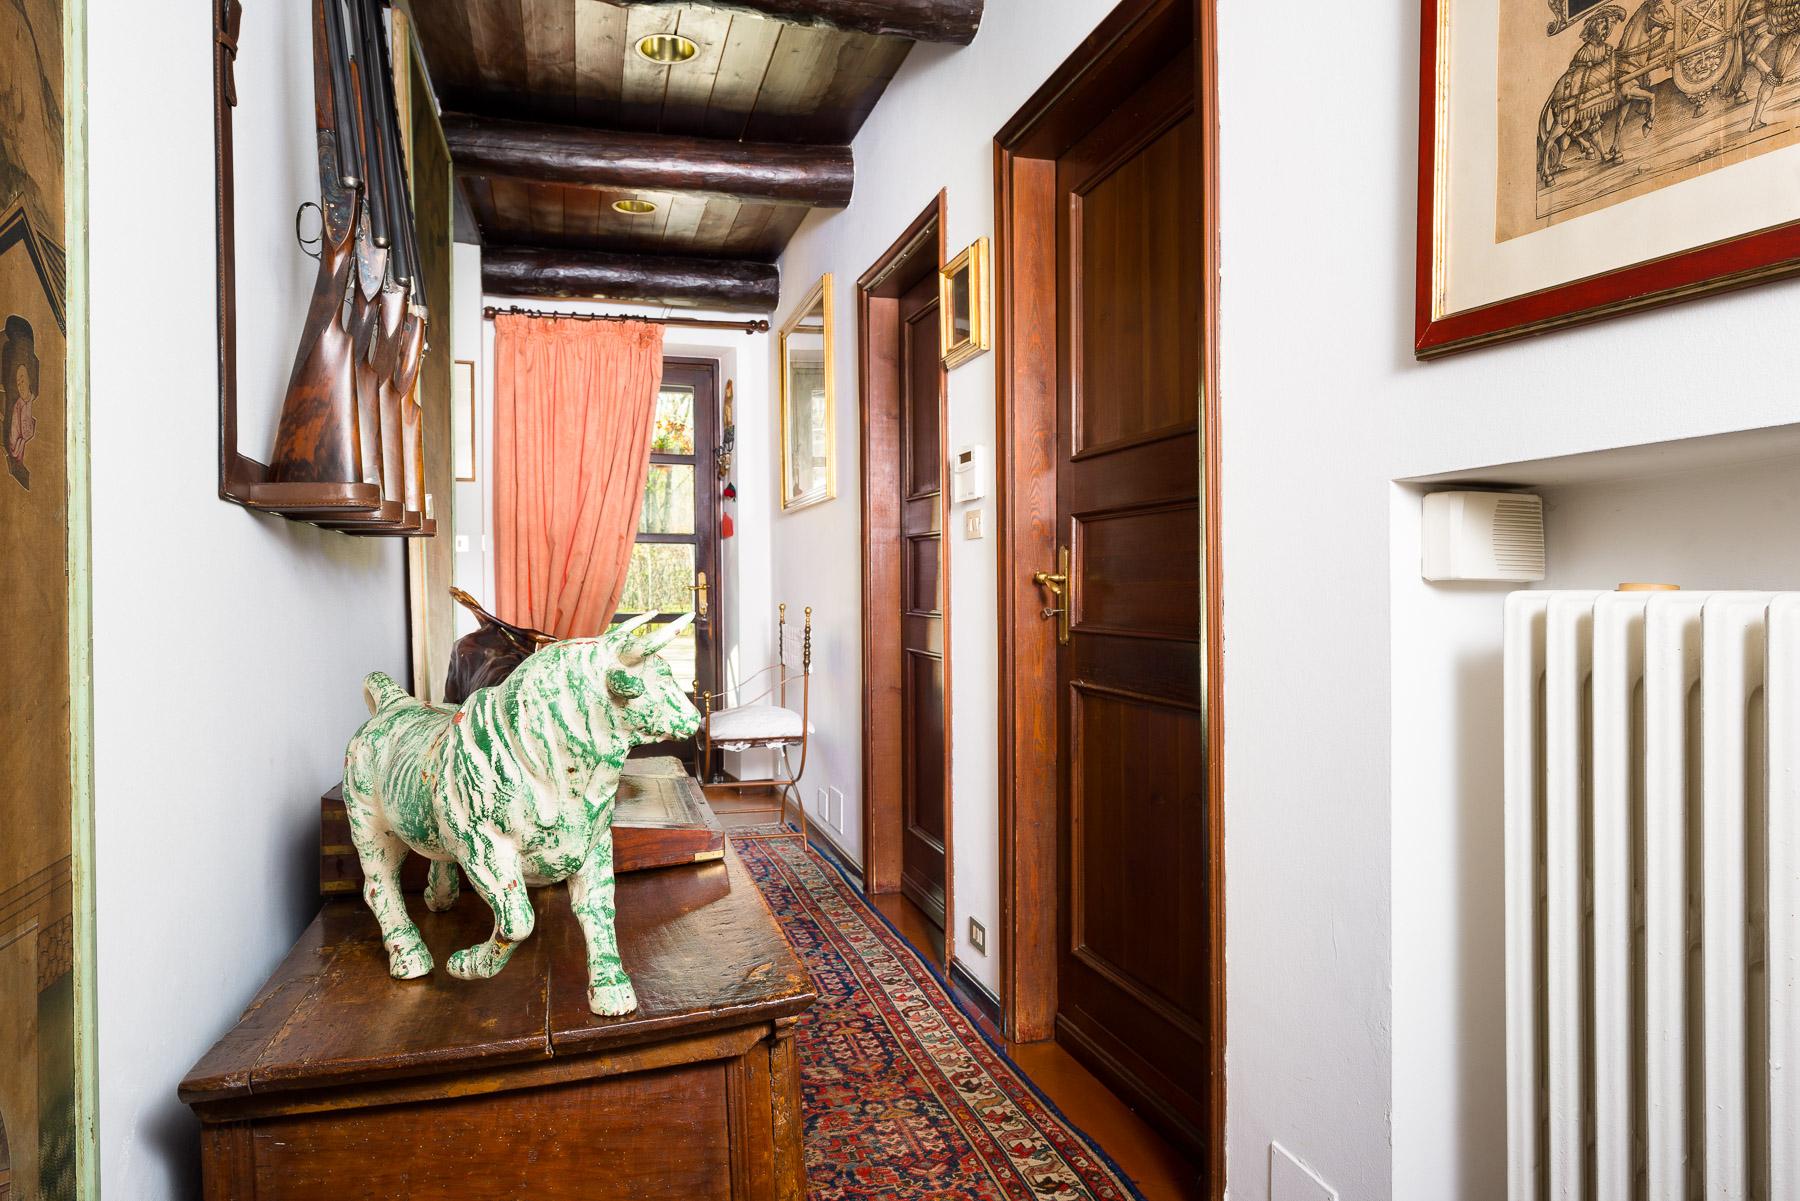 Casa indipendente in Vendita a Venaria: 5 locali, 500 mq - Foto 7